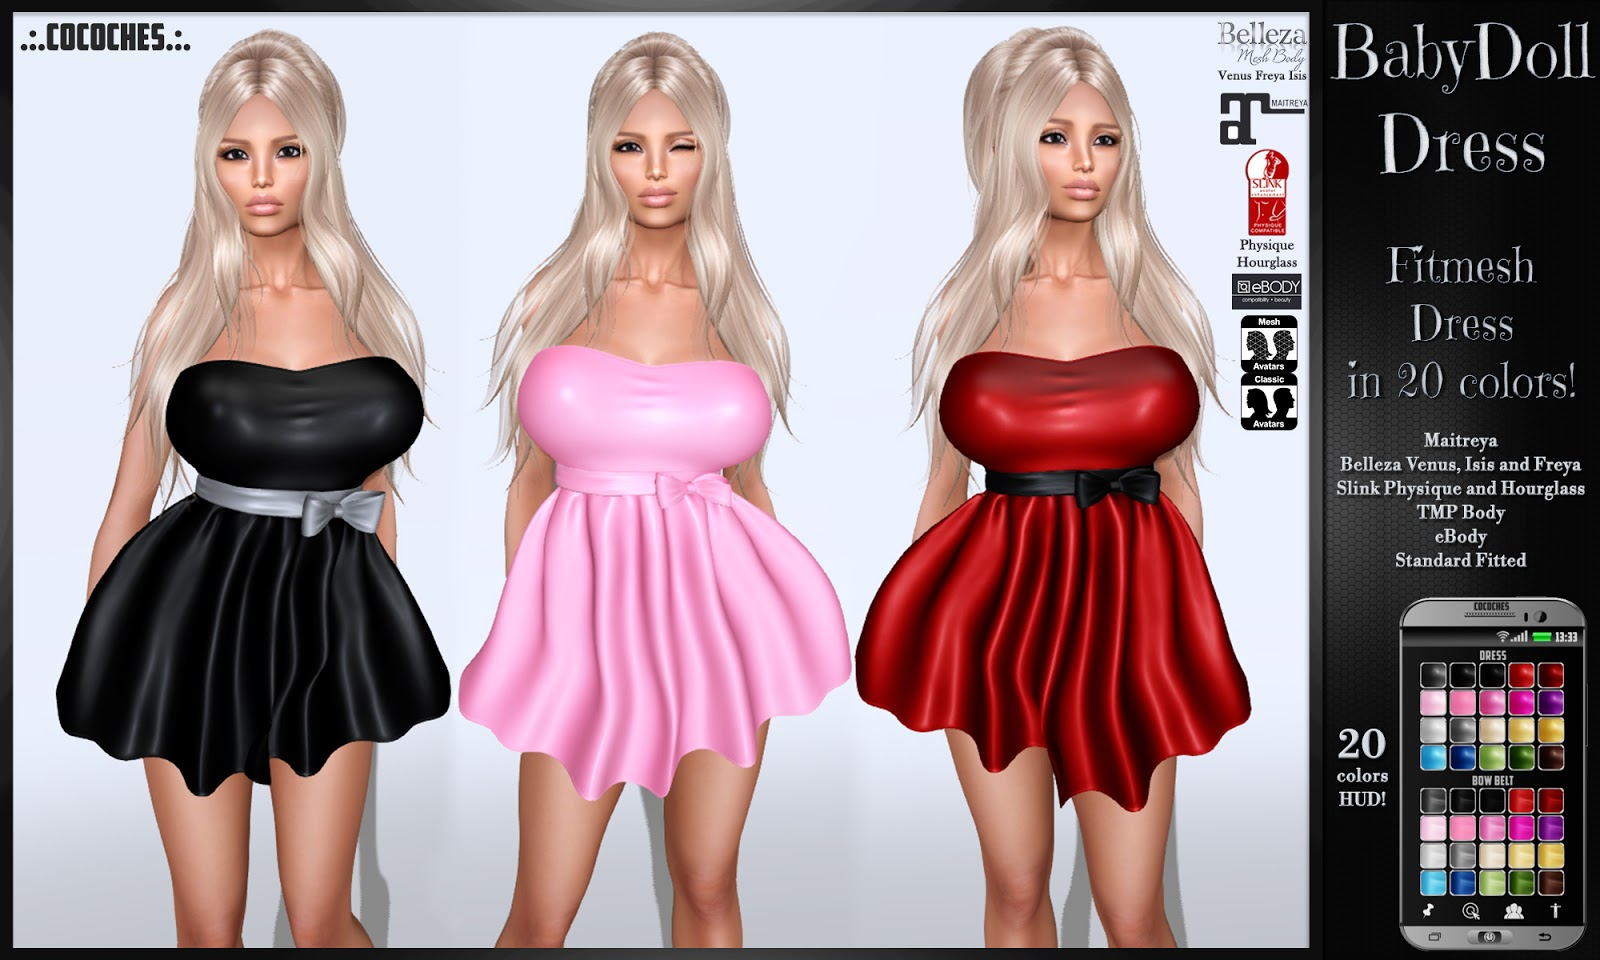 Venus Babydoll Dress